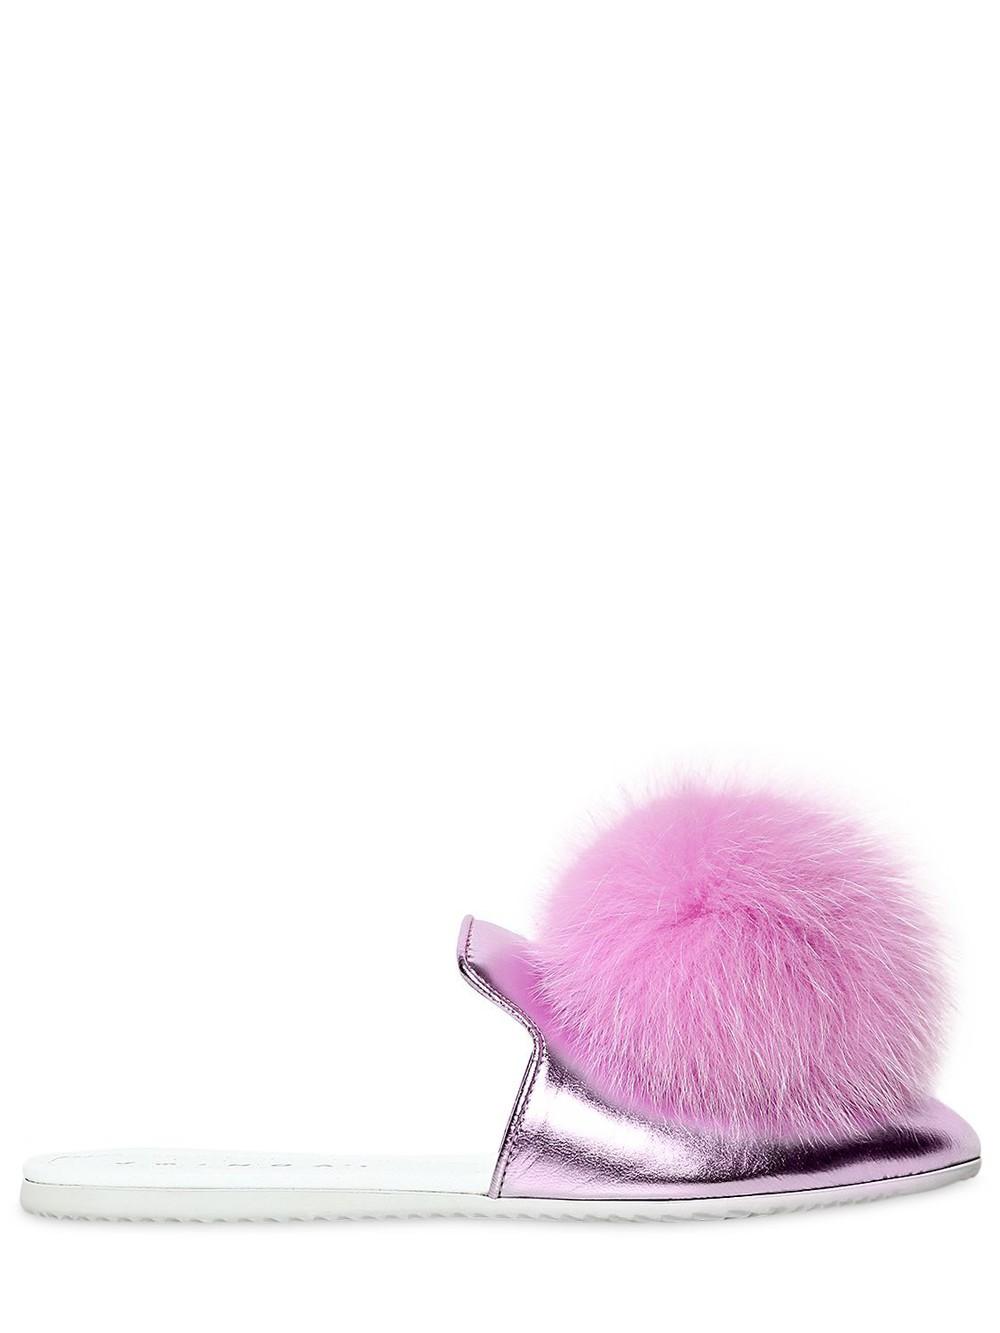 JOSHUA SANDERS Metallic Leather Mules W/ Fox Pompoms in pink